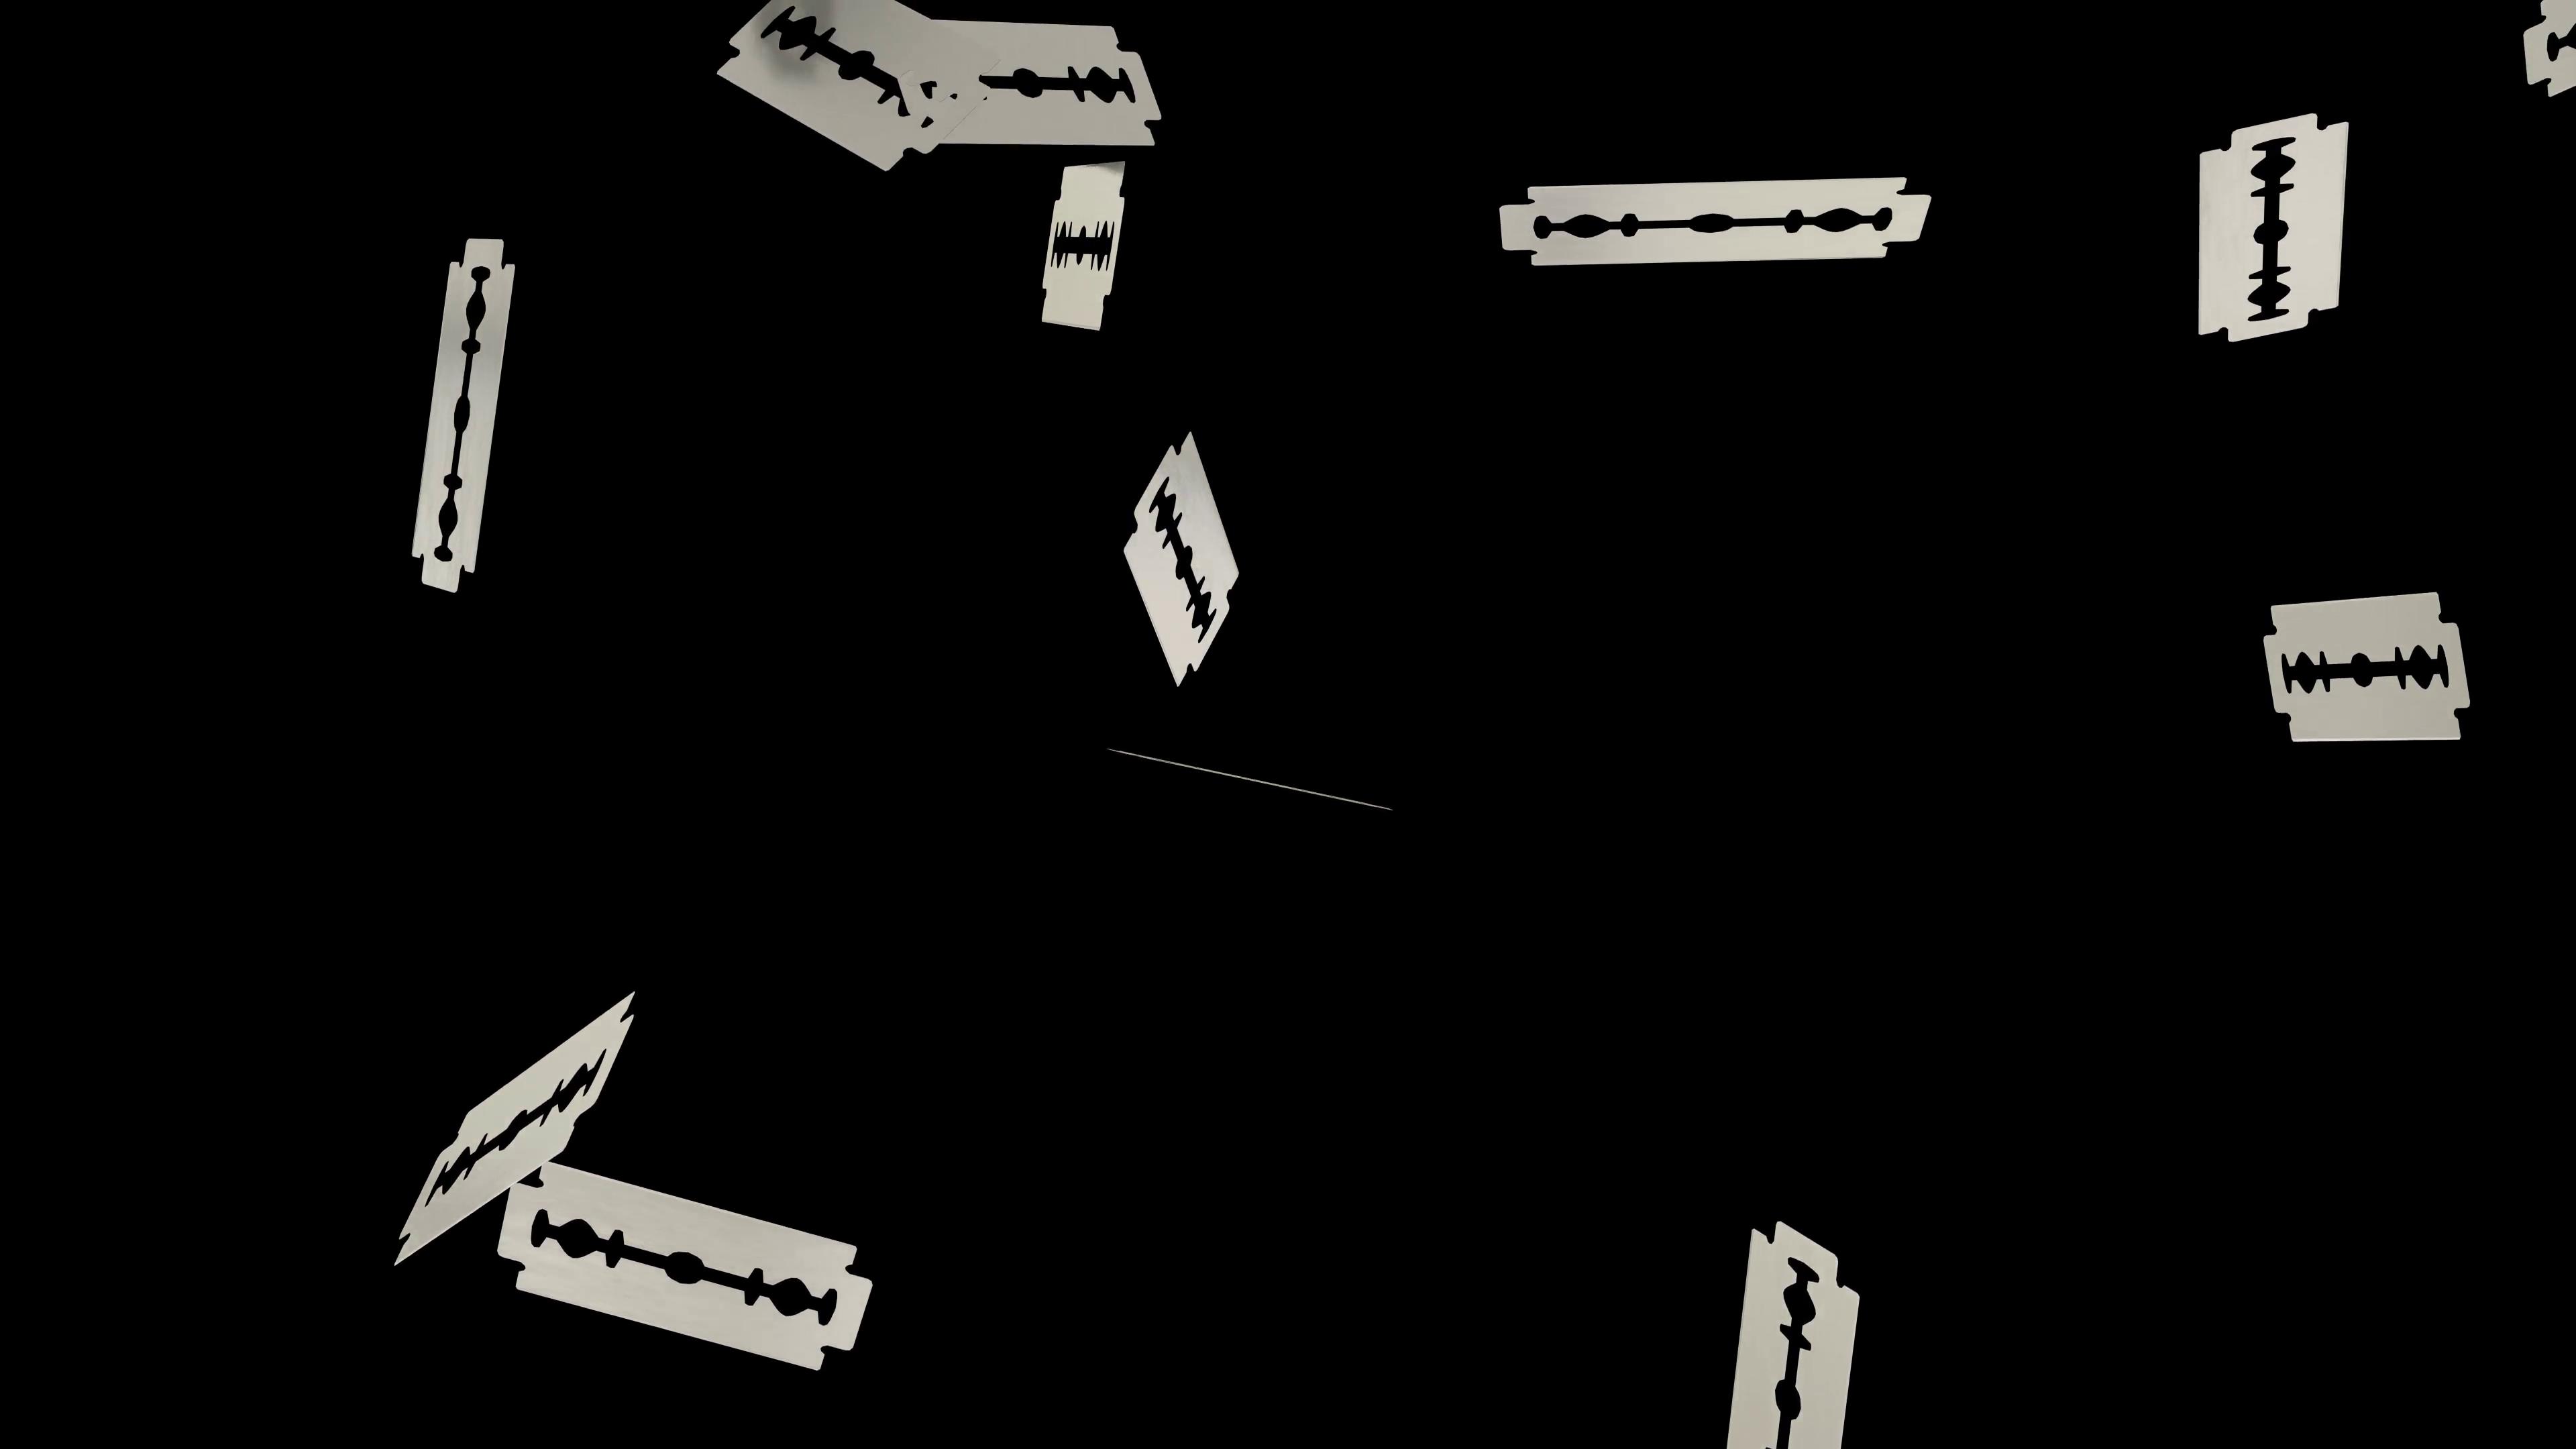 Animated light rain of plain razor blades against transparent background.  Alpha channel embedded wit 4k PNG file. Motion Background.